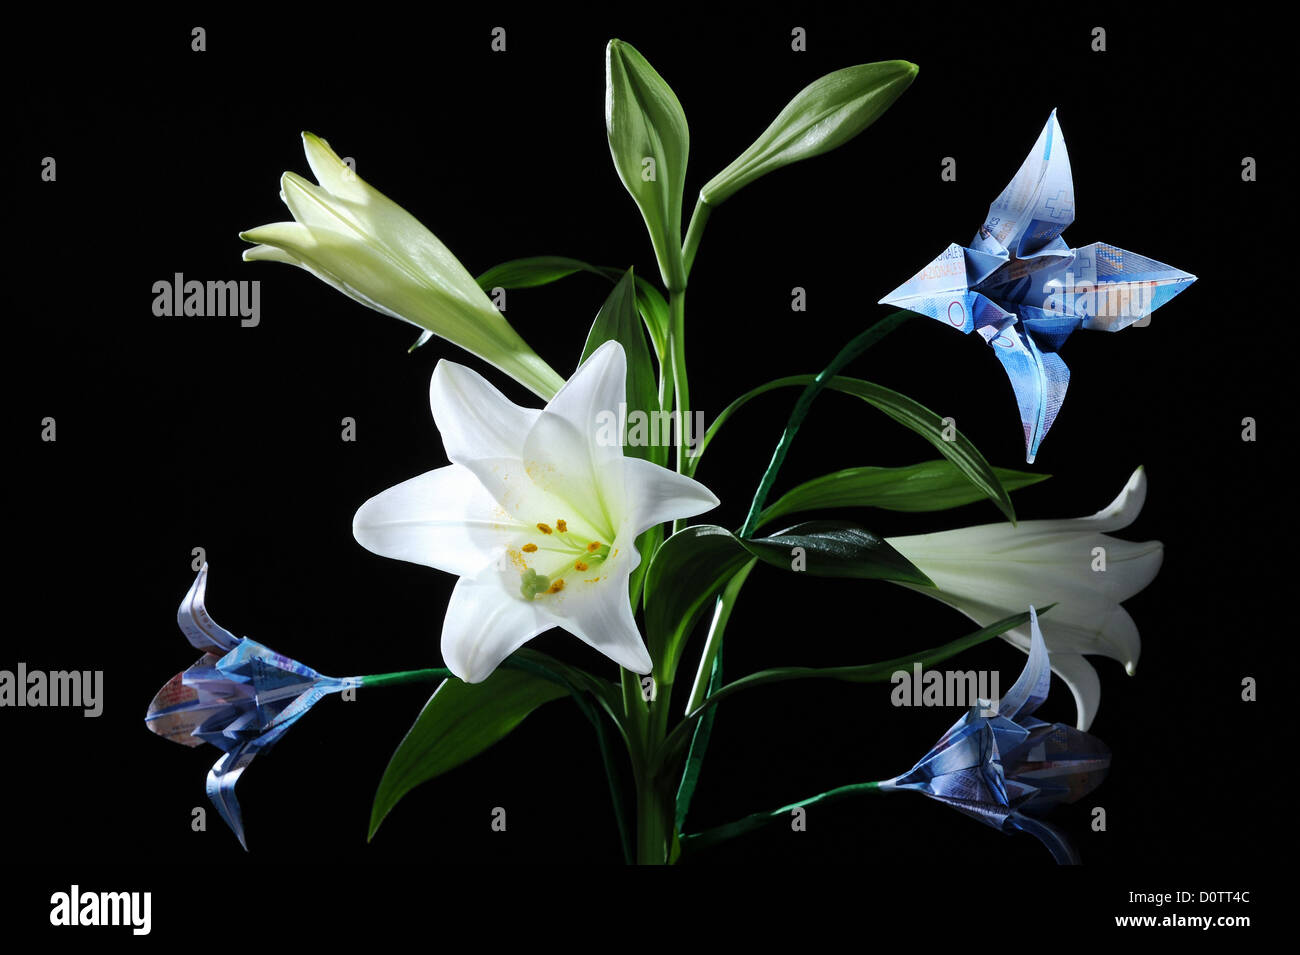 Flowers Origami Notes Money Growth Prosper Grow Swiss Franc